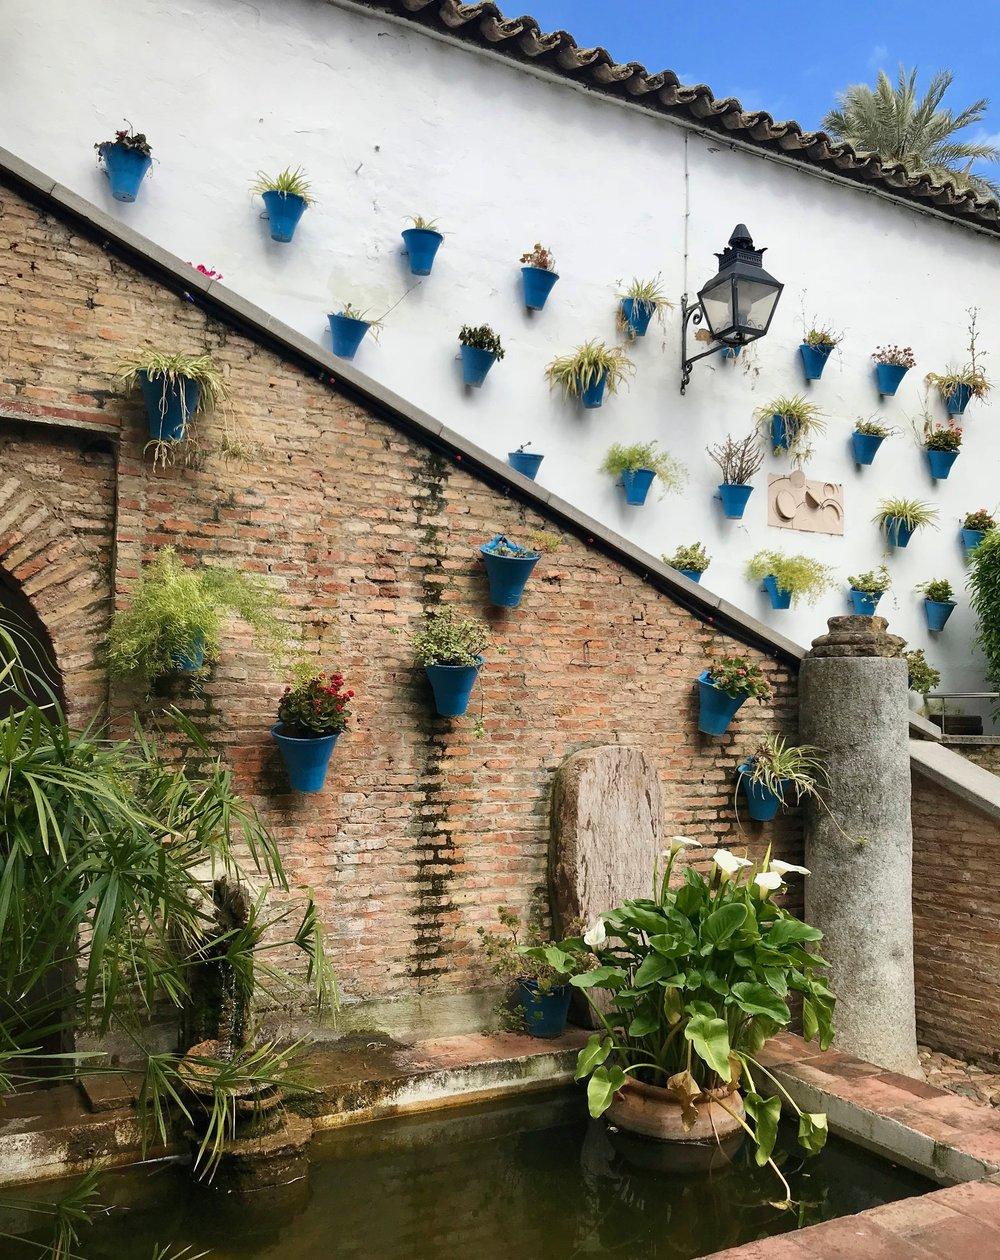 Patio inside el Zoco, an artisanal marketplace